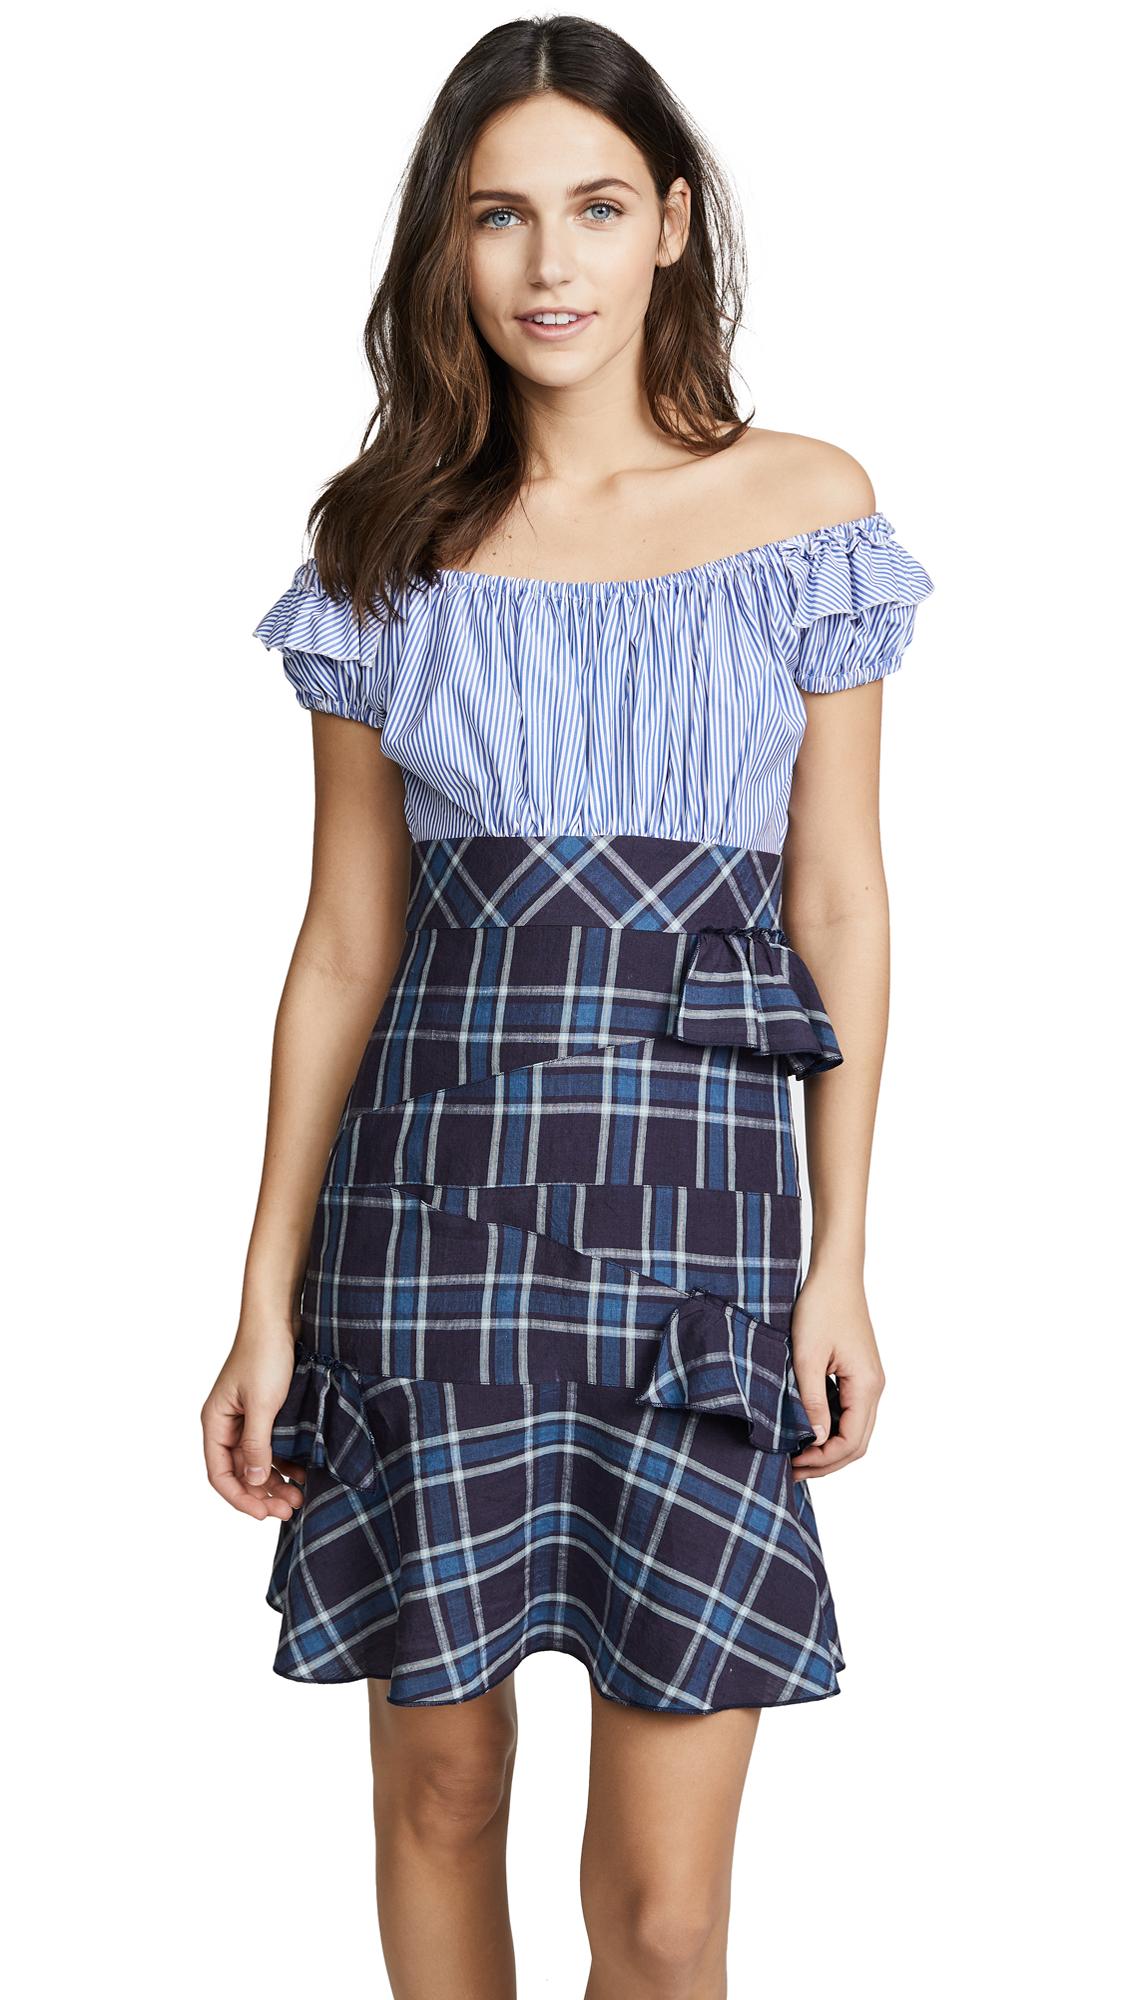 Amelia Toro OTS Ruffle Dress - Stripe Blue/Plaid Blue